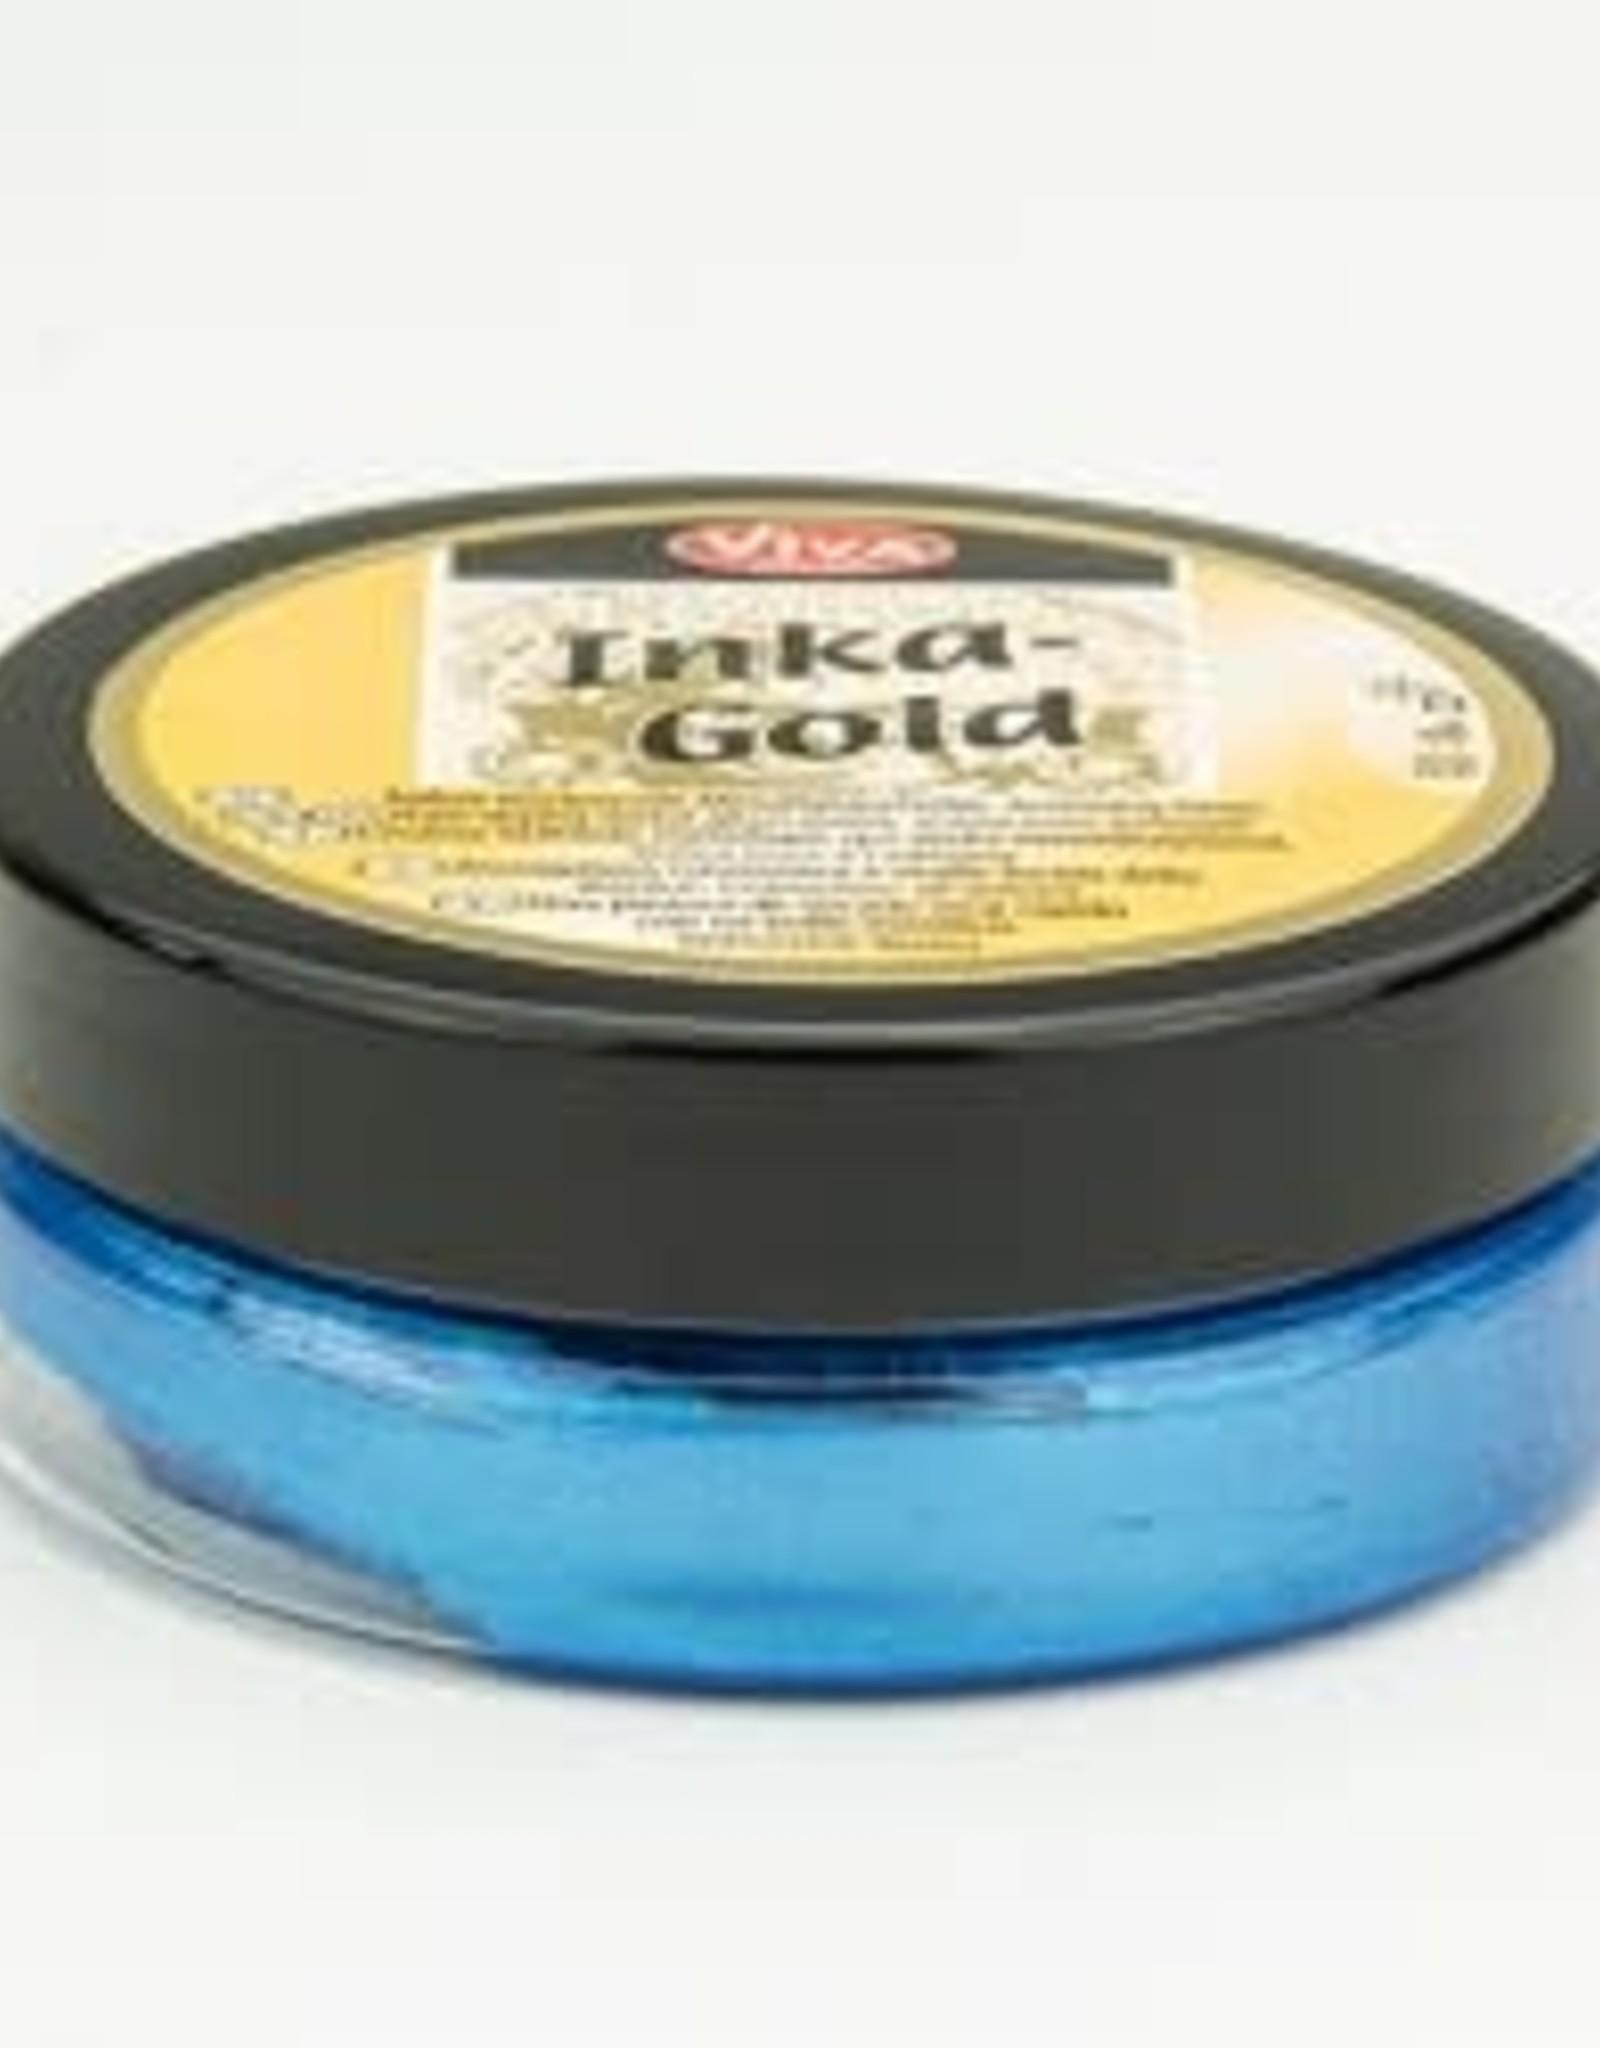 Inka-Gold Steel Blue